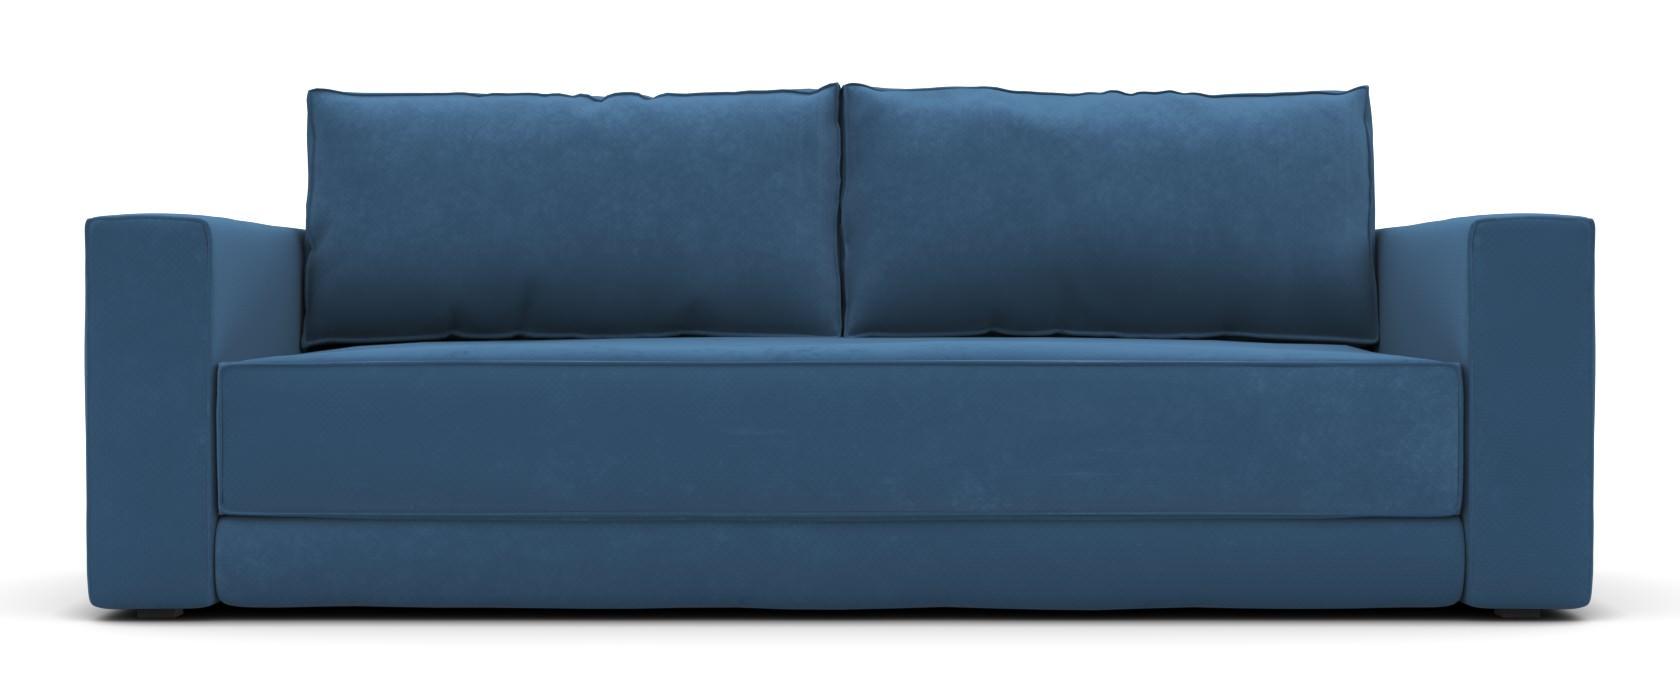 Тримісний диван Donato - Pufetto